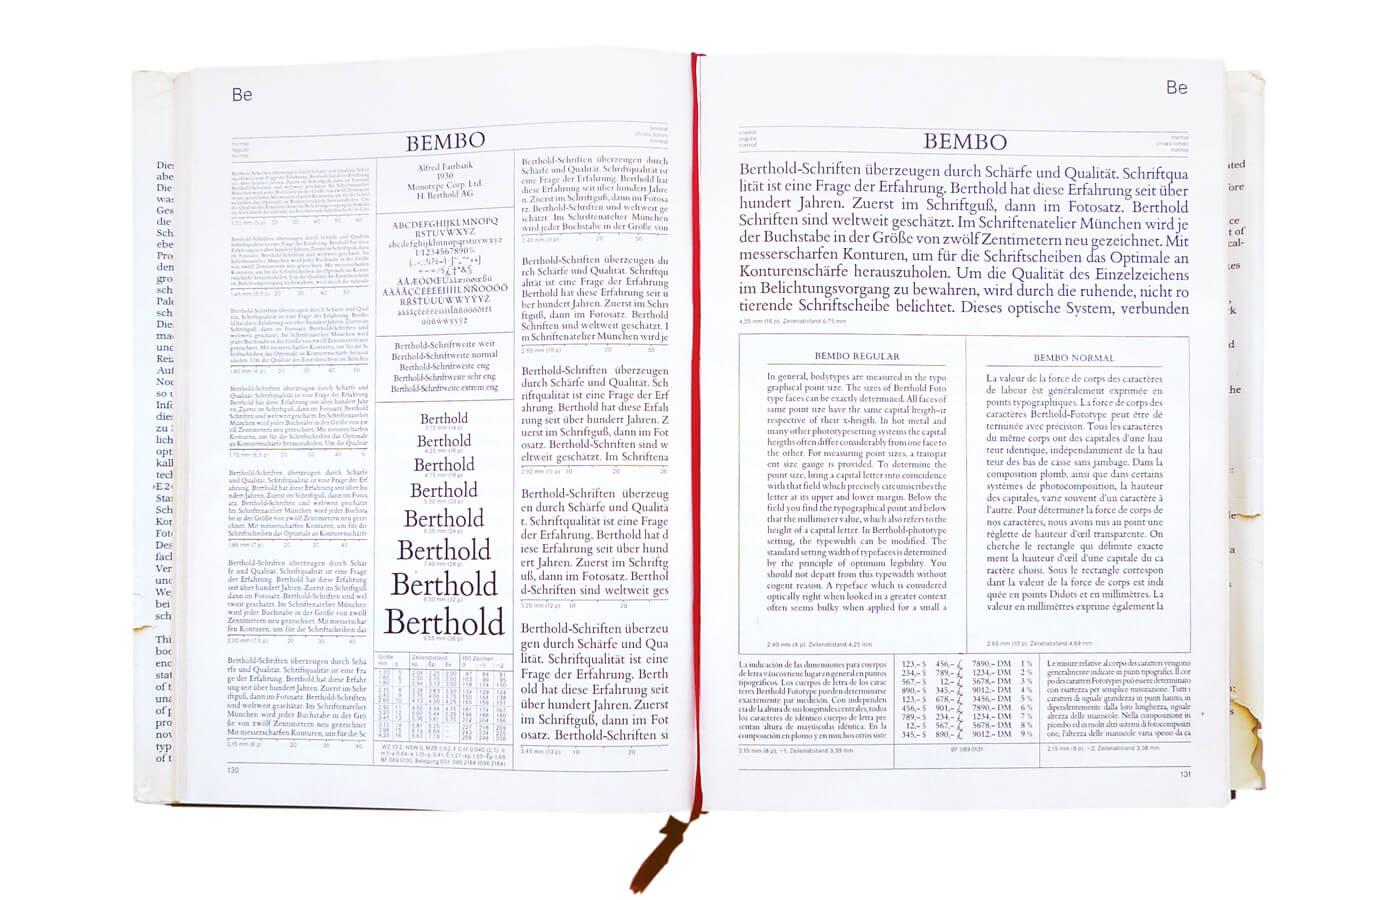 E2 Berthold Fototypes Body Types Vol. 1: Synopsis, Katalog, Layouts (577 typefaces)